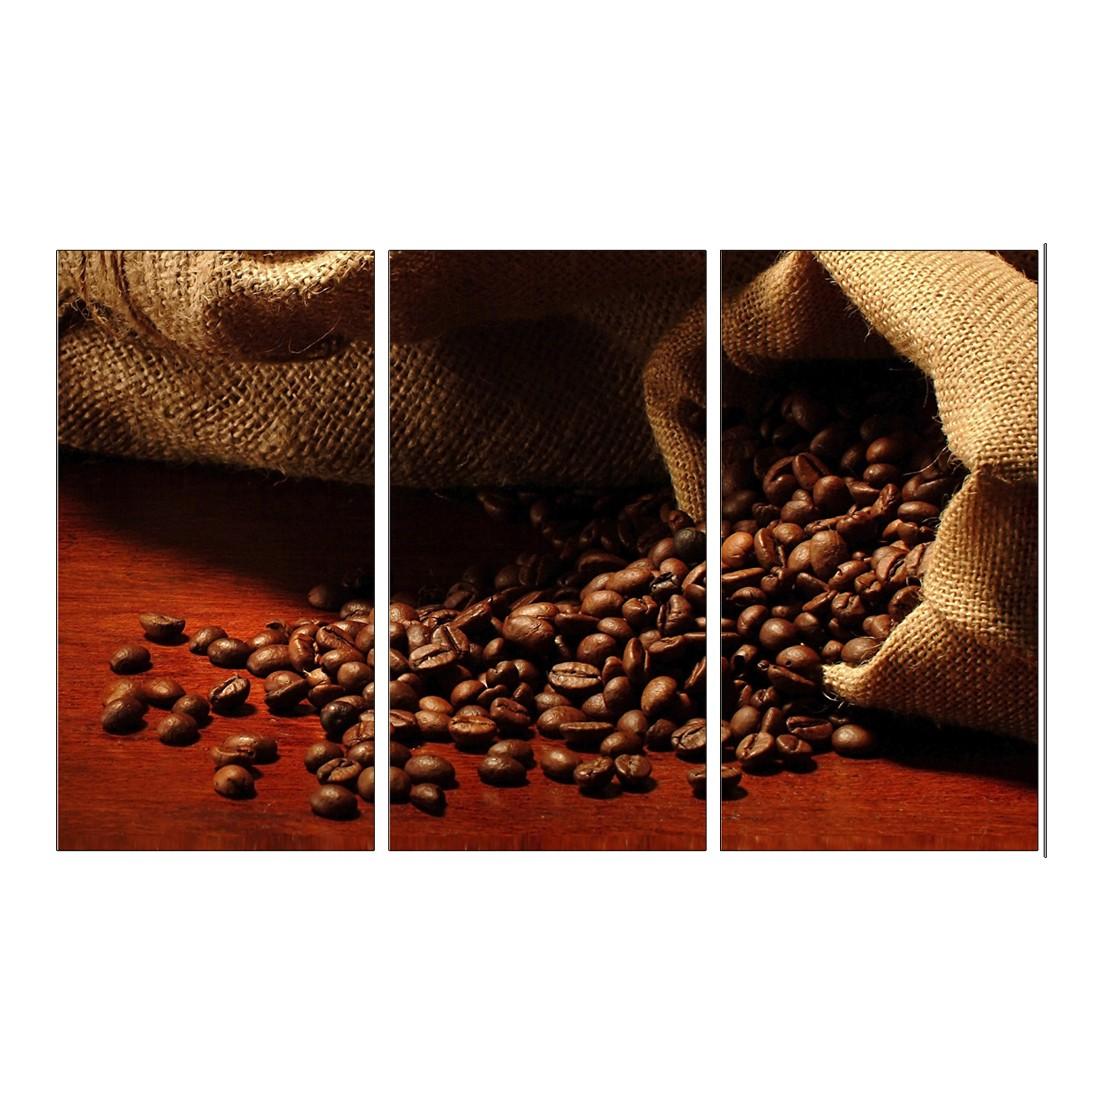 Leinwandbild Kaffeebohnen – 120 x 80cm, Gallery of Innovative Art günstig bestellen